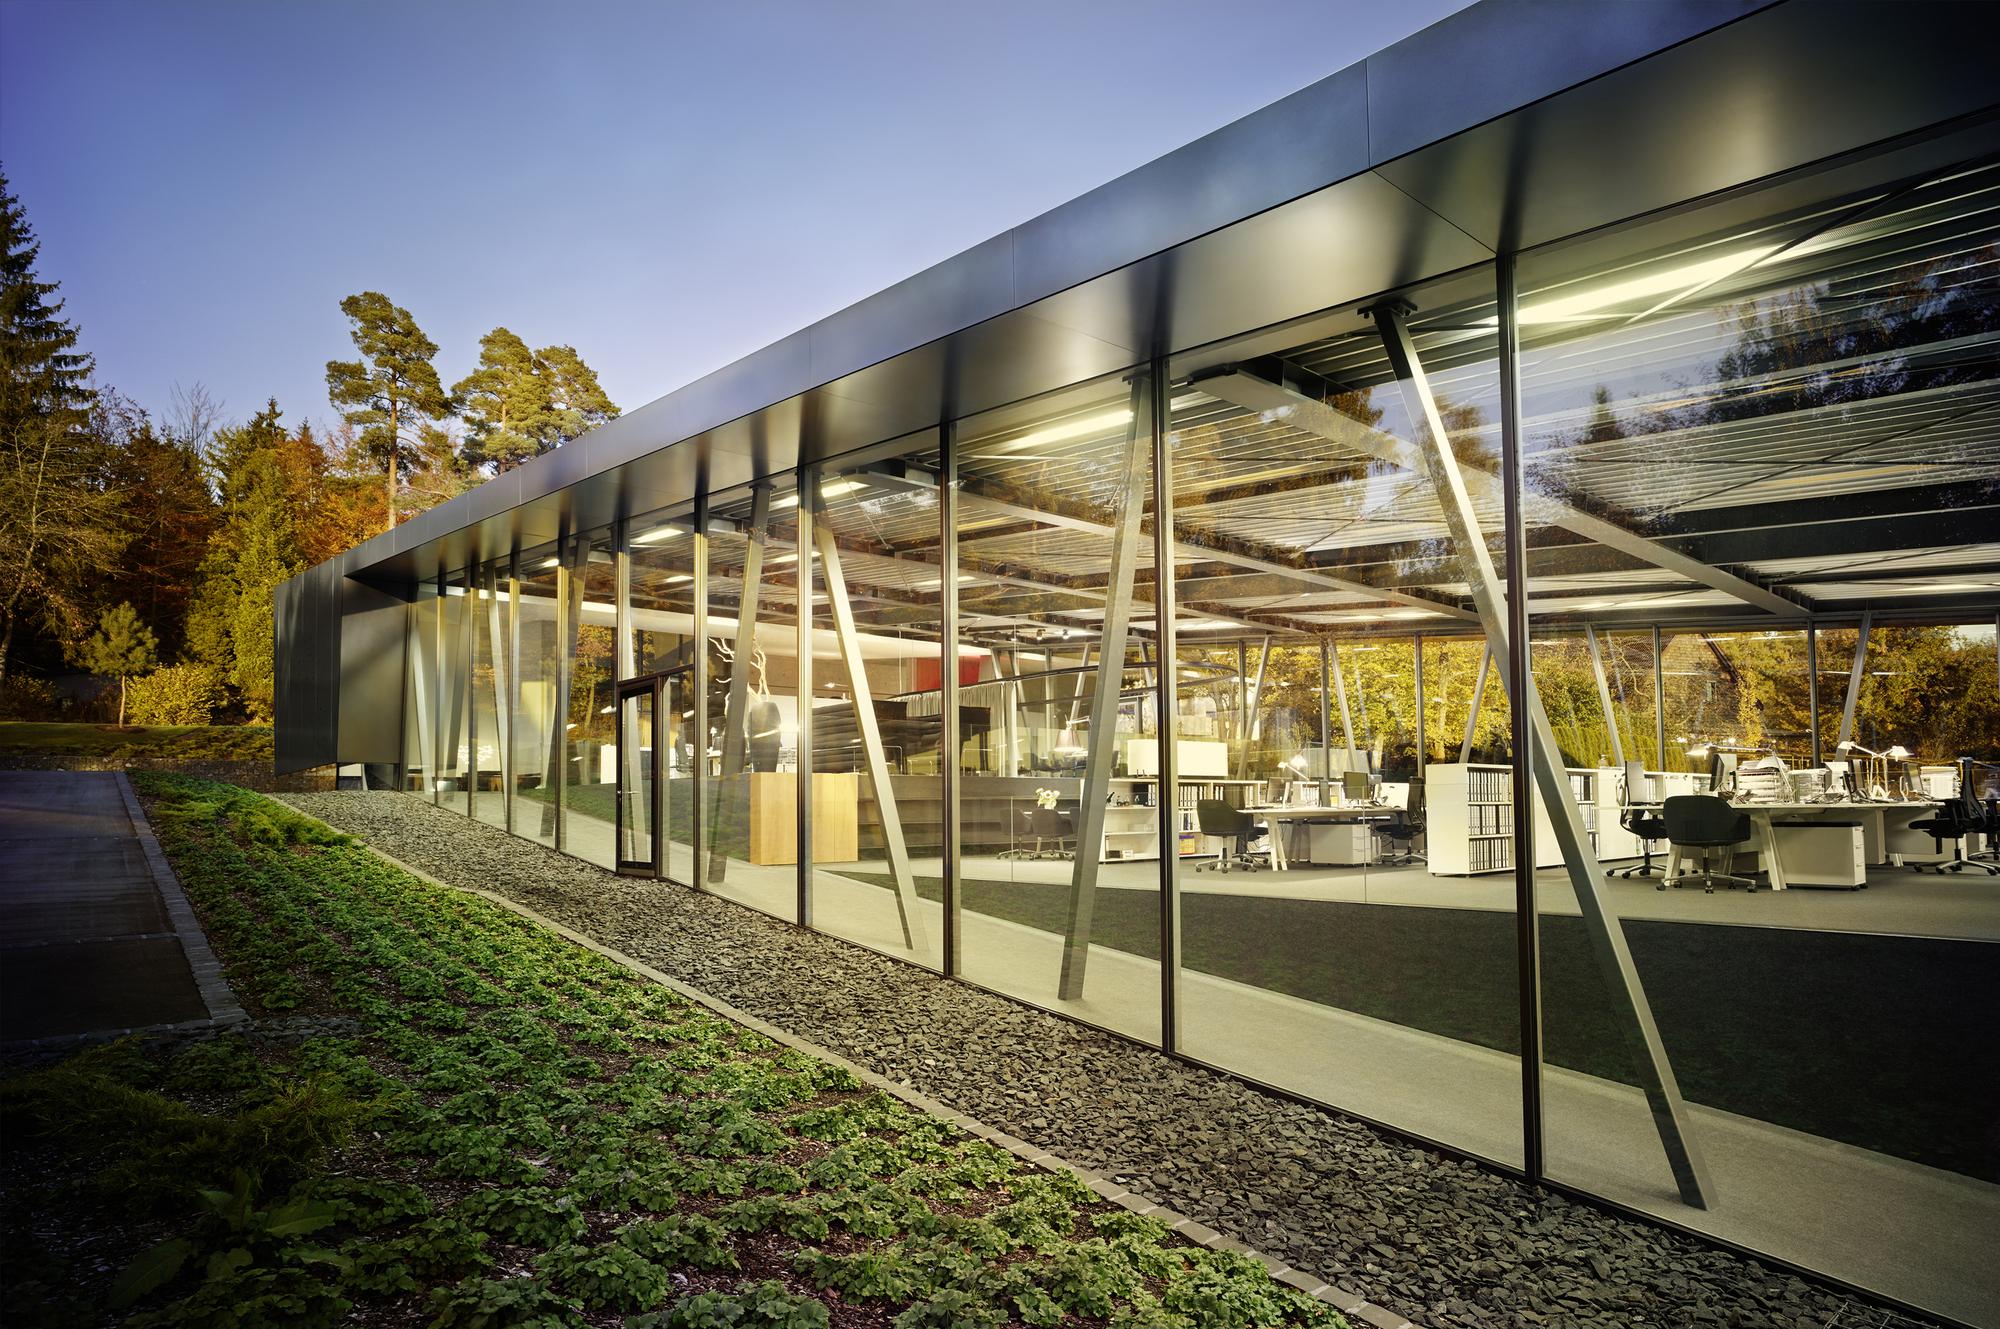 gallery of architecture campus schmelzle partner 12. Black Bedroom Furniture Sets. Home Design Ideas